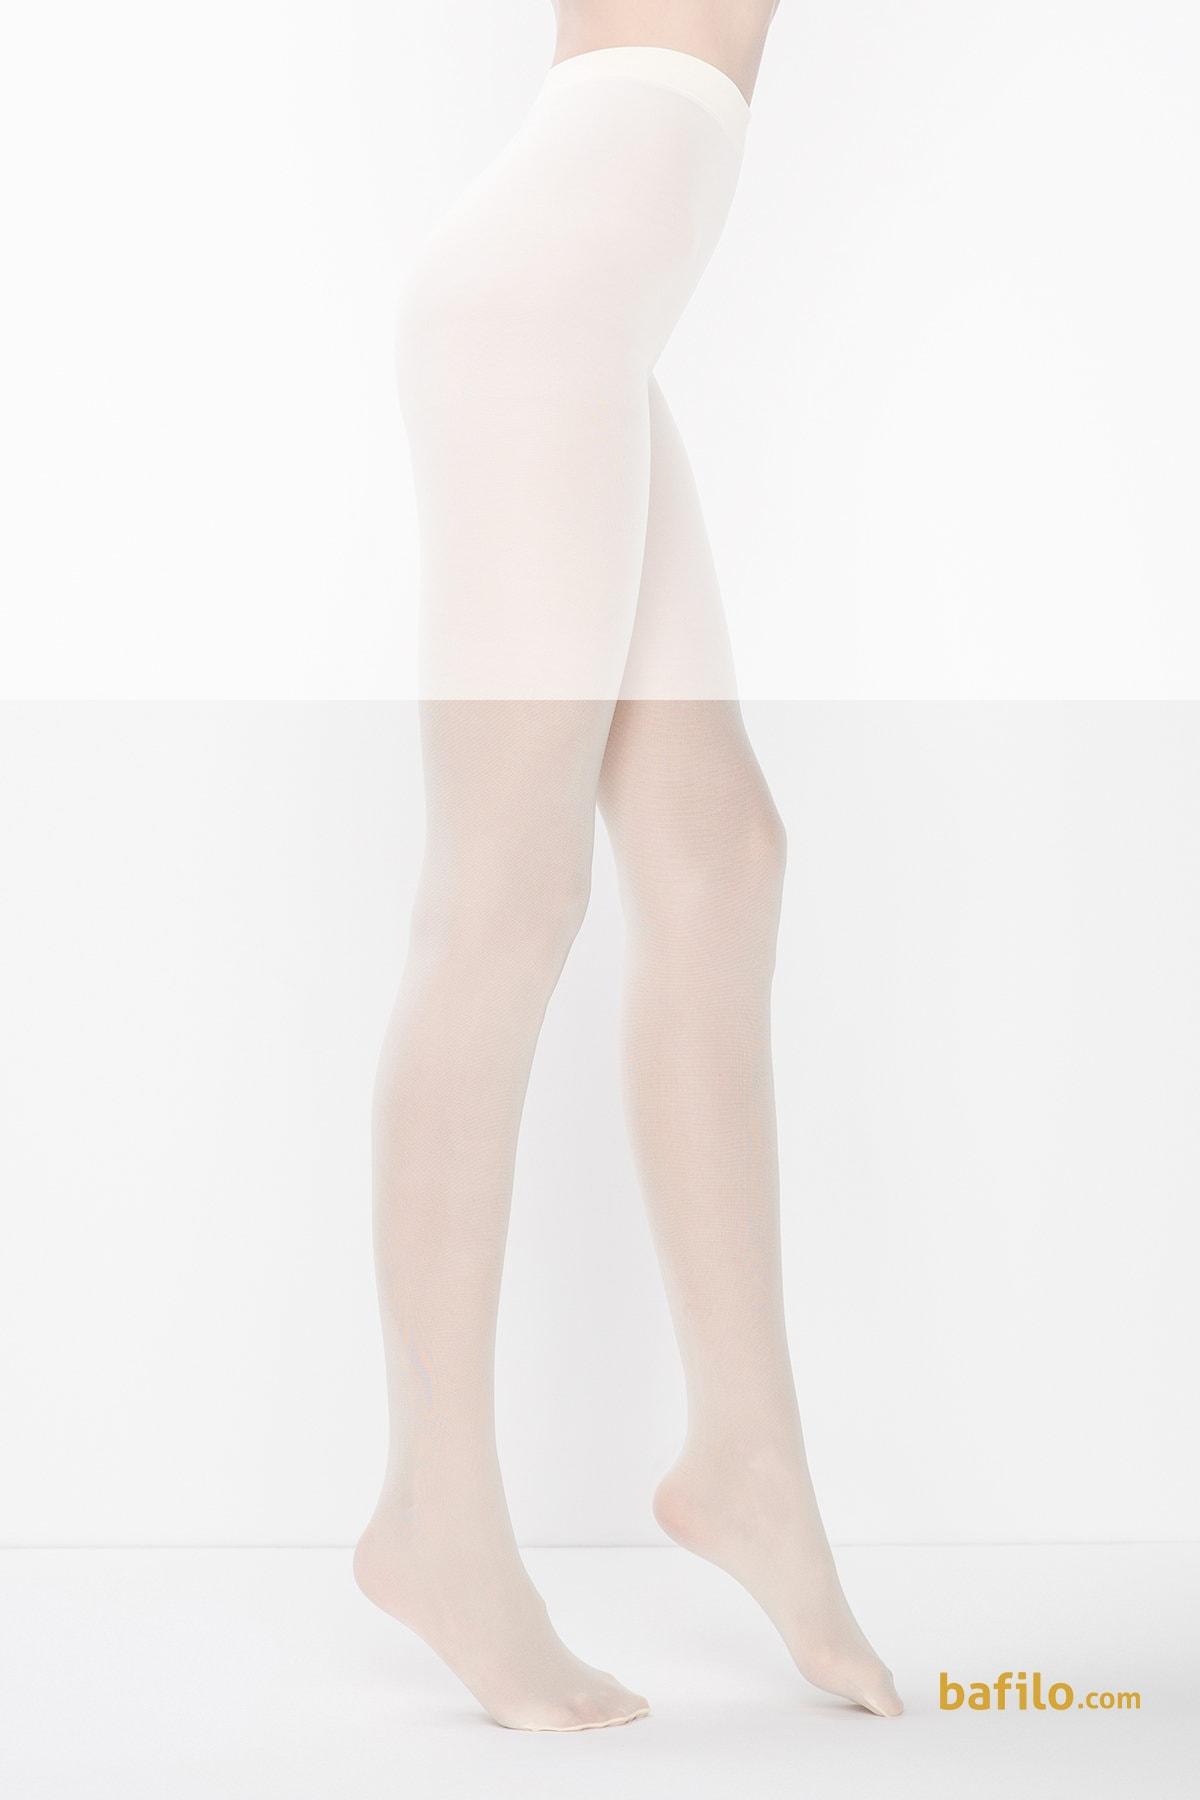 جوراب شلواری زنانه پنتی Mikro 40 وانیلی - Thumbnail